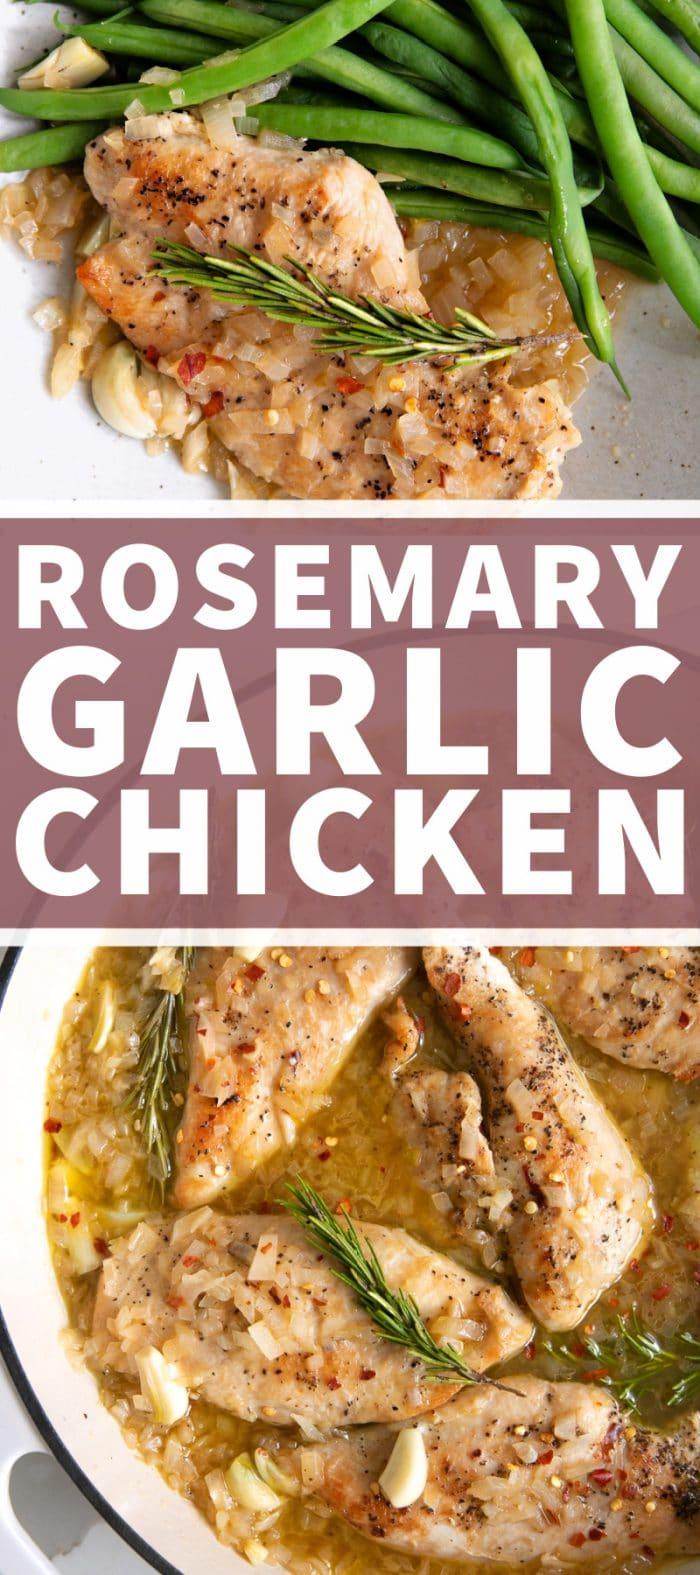 Rosemary Garlic Chicken Recipe pinterest pin collage image